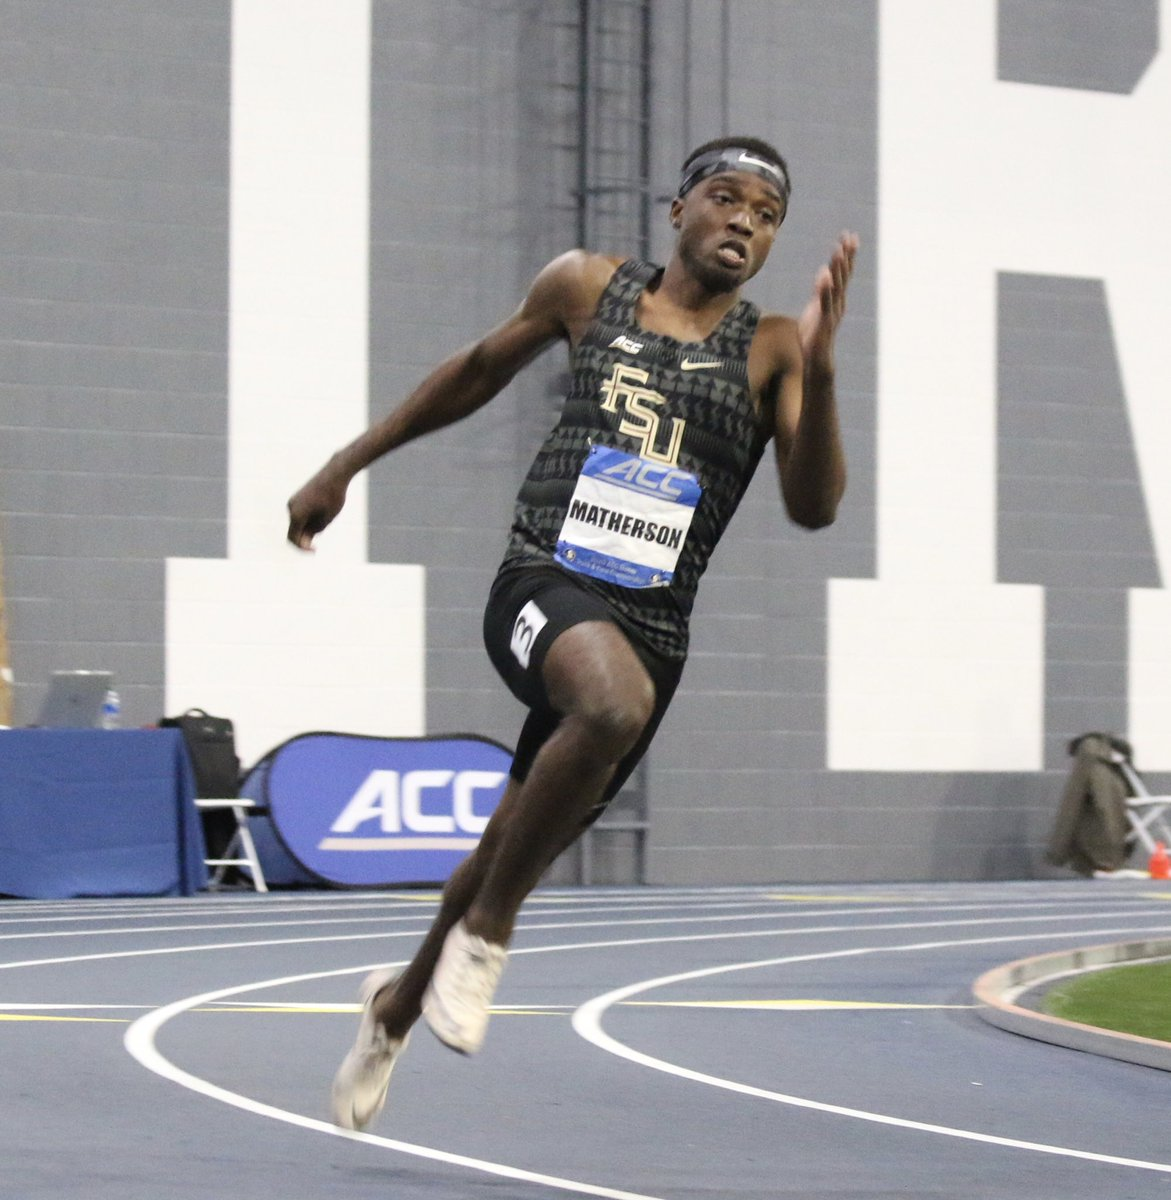 Jhevaughn Matherson ran his best 200m indoor time